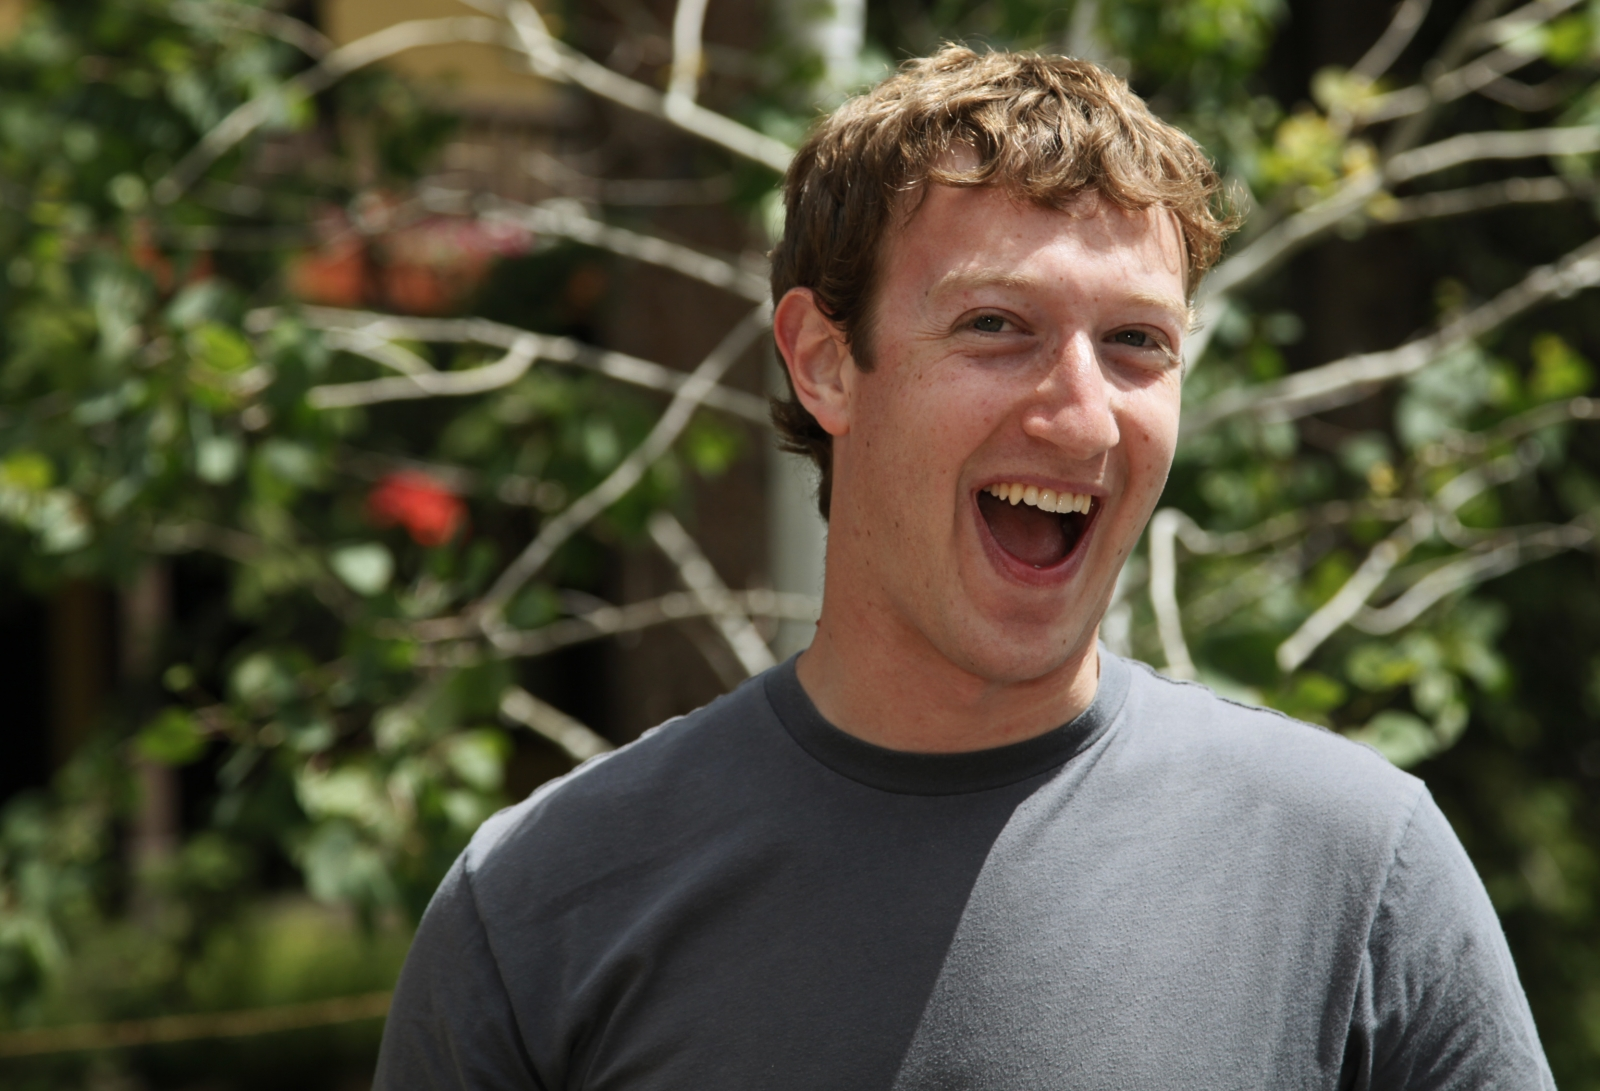 Facebook CEO Mark Zuckerberg in a grey t shirt